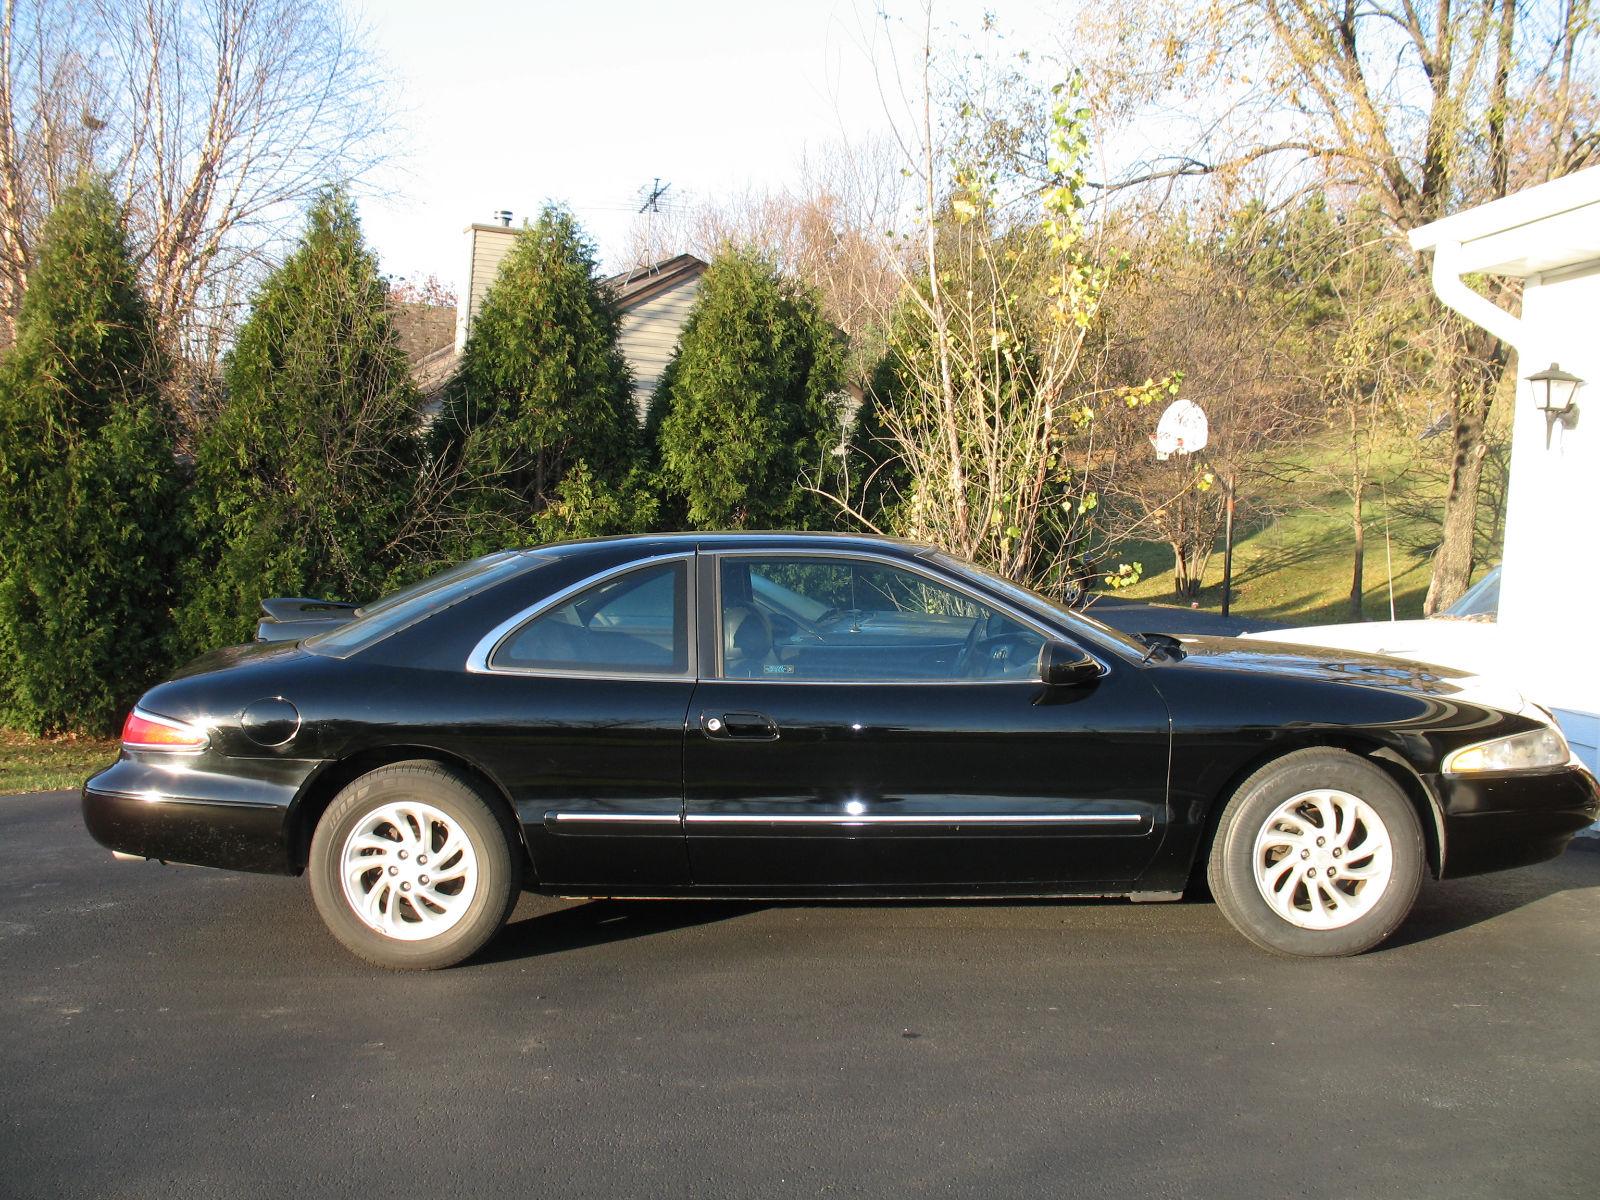 Tbird800 U0026 39 S 1998 Lincoln Mark Viii